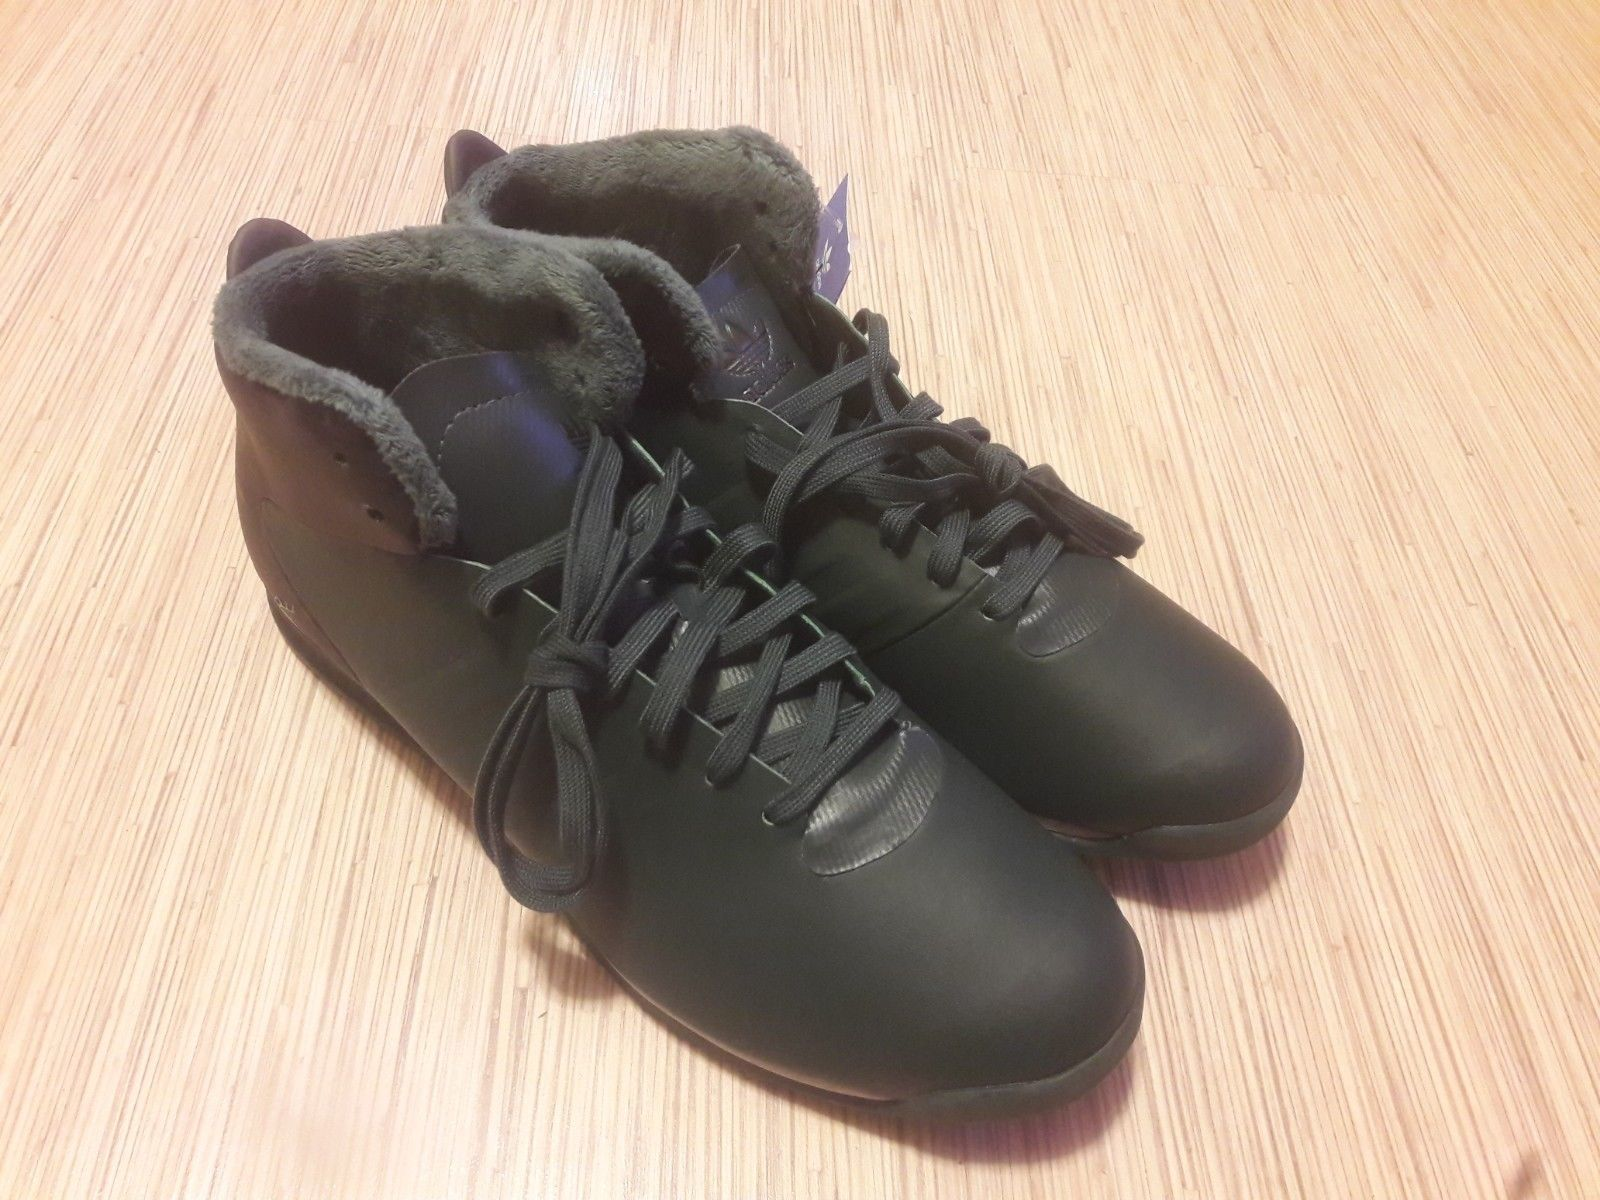 best service 56126 ba1d9 Adidas PORSCHE 911 2.0L MID Winter Sneakers Mens Walking S76116 Sz US 12